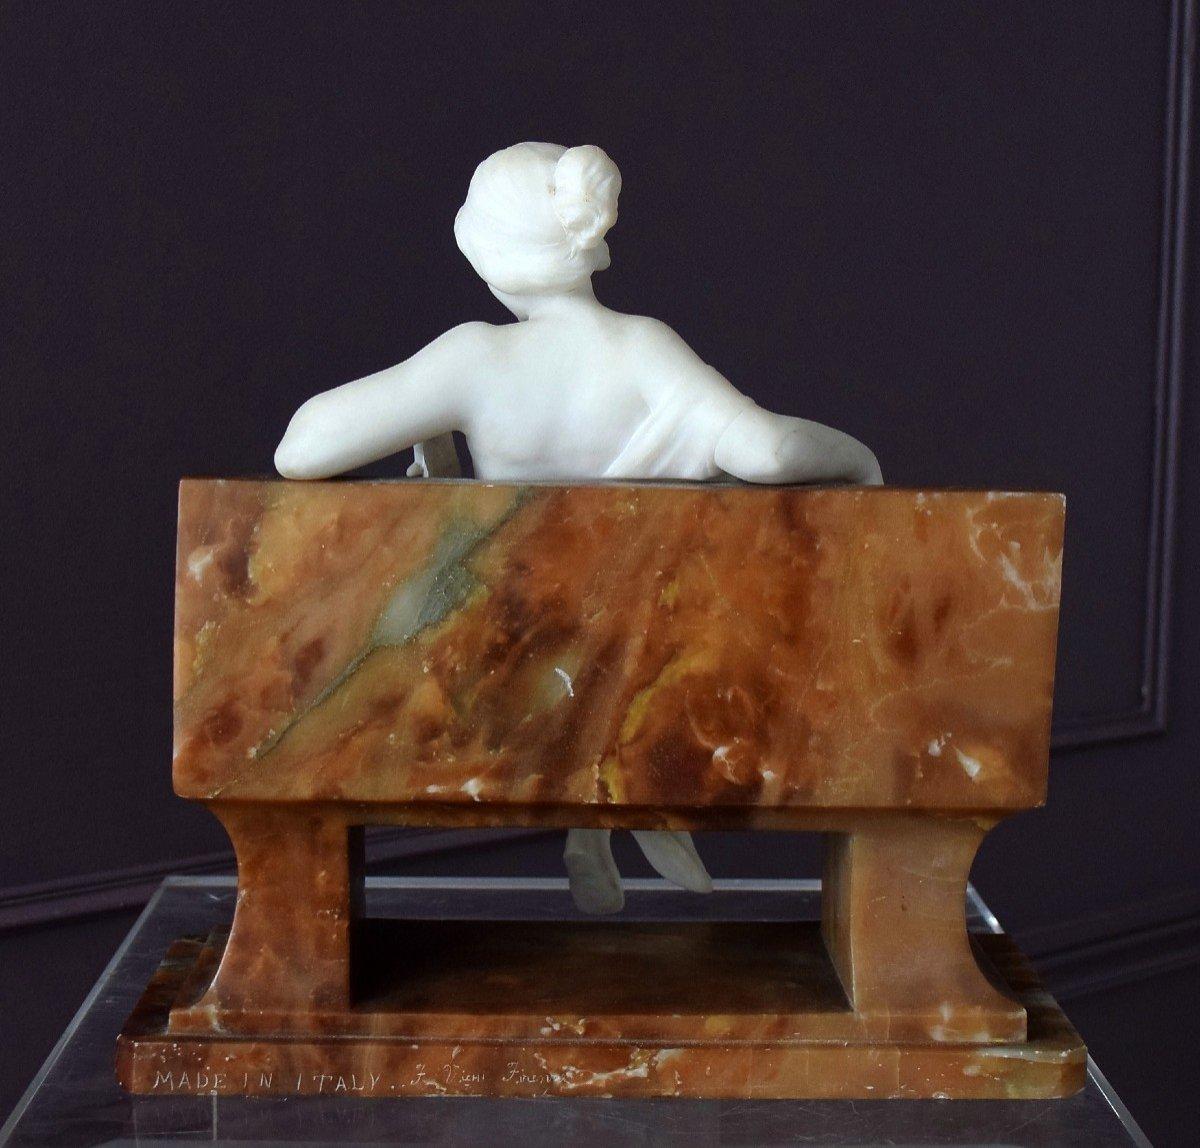 Nymph By Ferdinando Vichi Carrara Marble And Alabaster Italy-photo-8